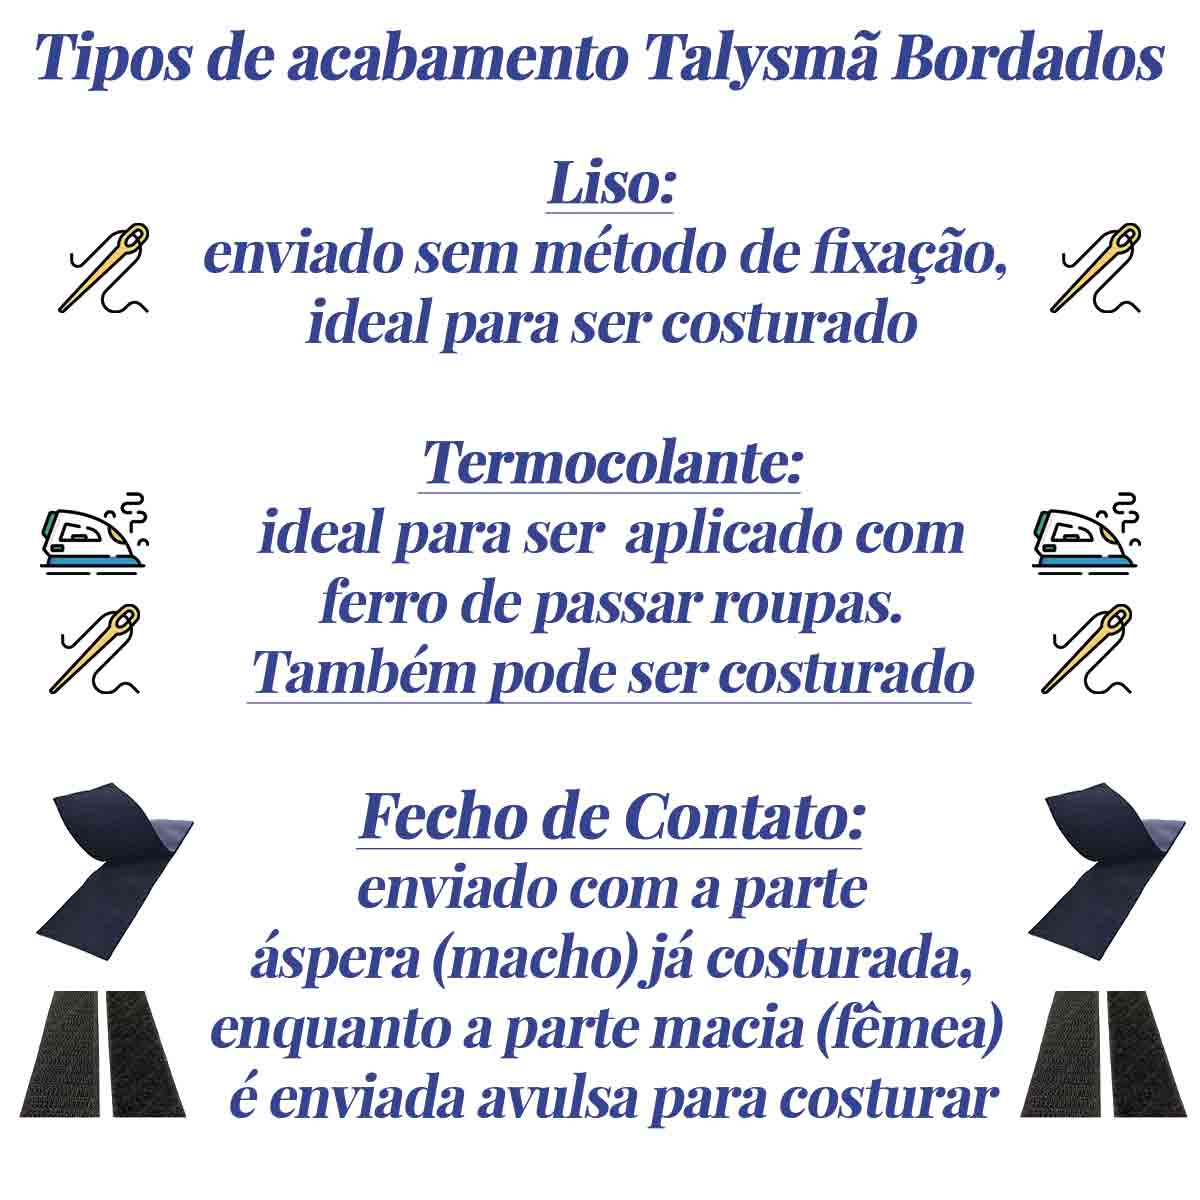 Patch Bordado - Alfabeto Letra S DV80532-419  - Talysmã Bordados